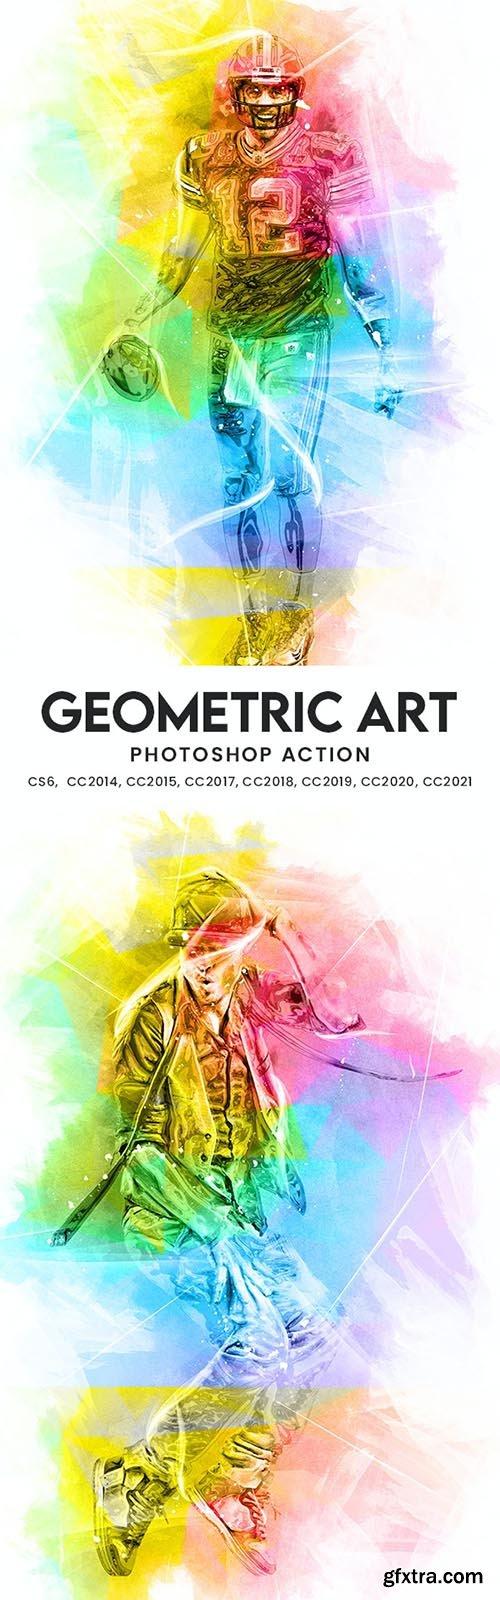 GraphicRiver - Geometric Art Photoshop Action 33954727